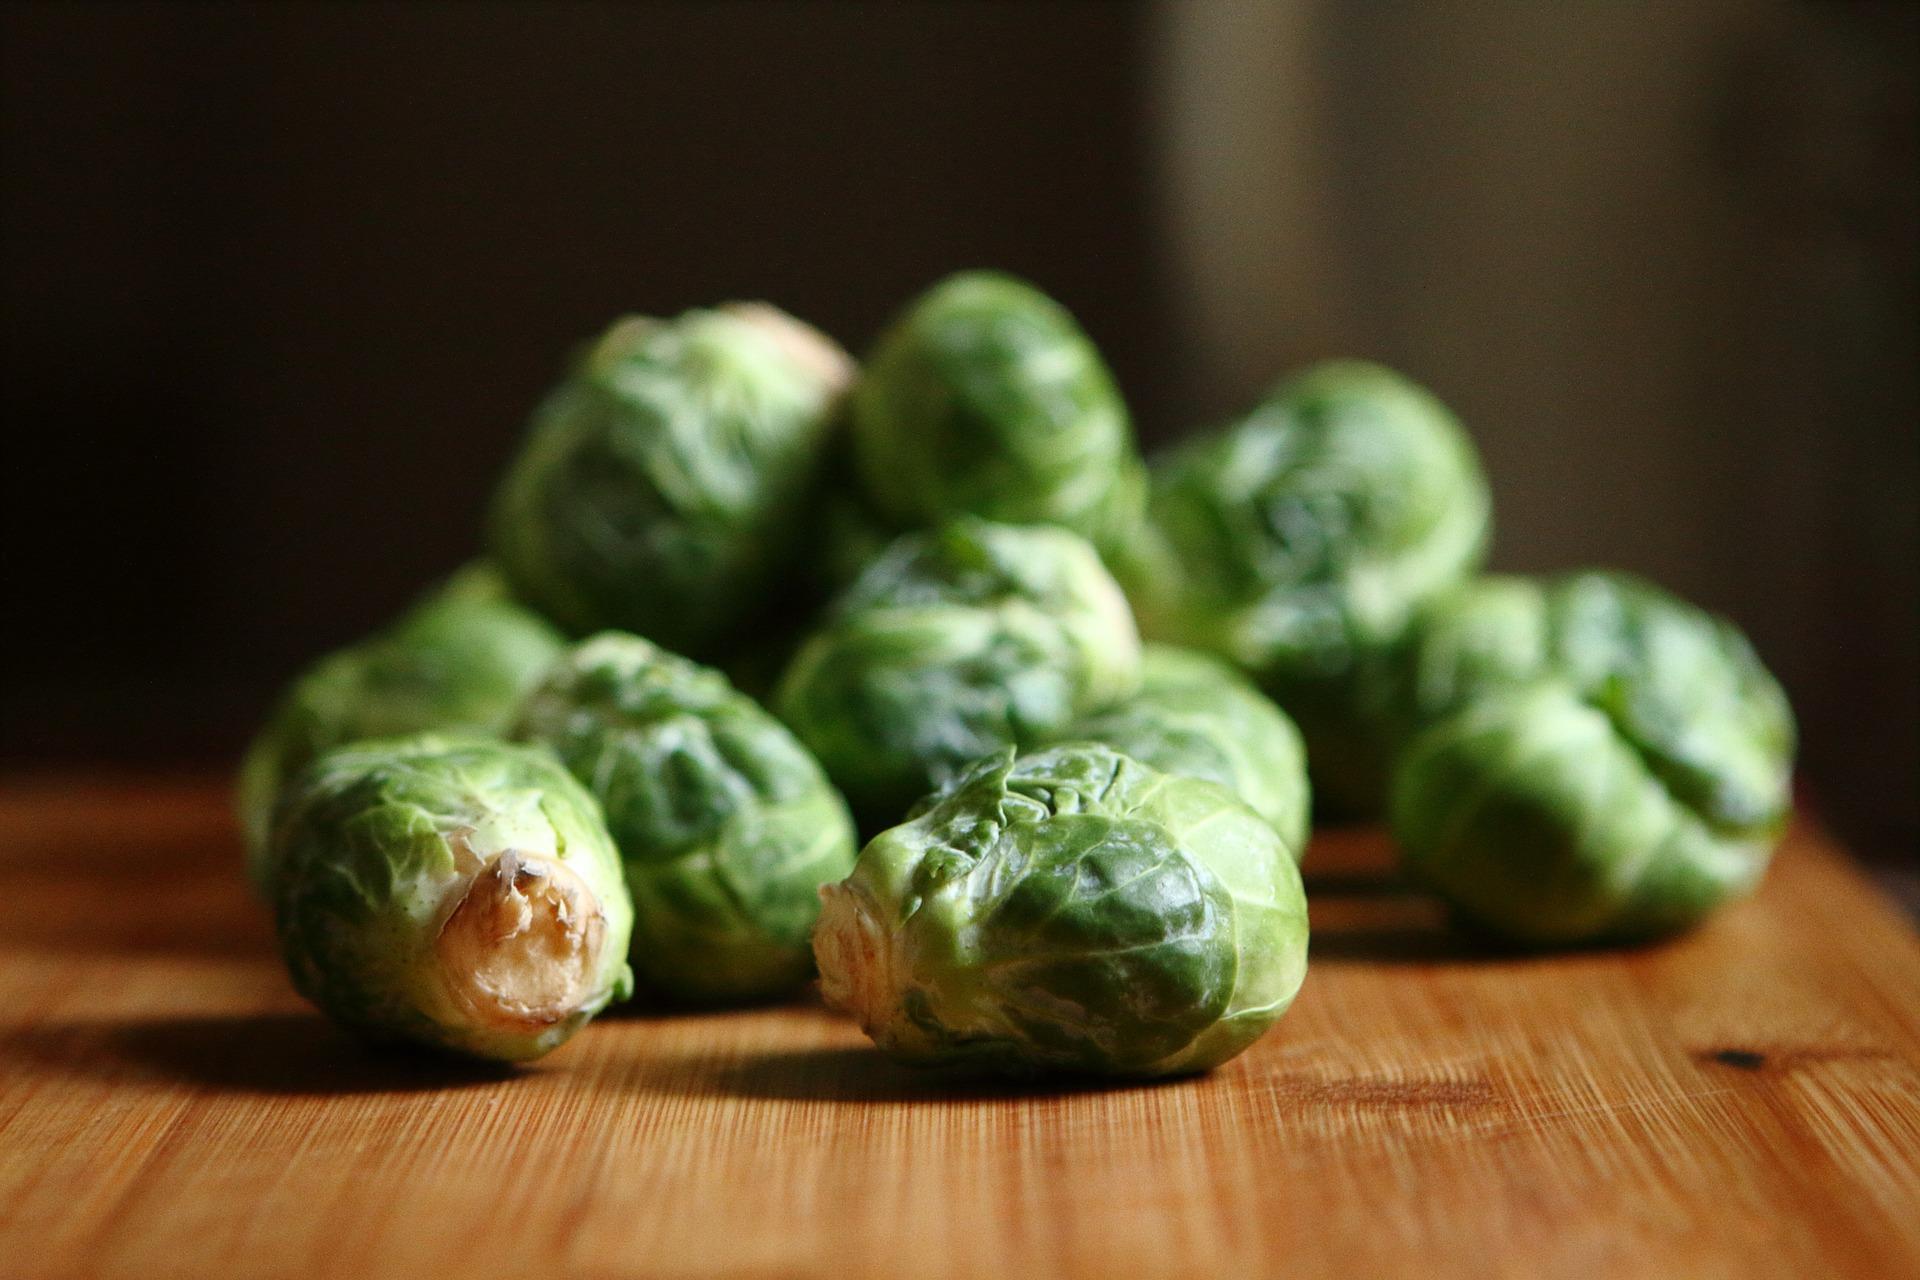 Sprouts | Unsplash pixabay.com